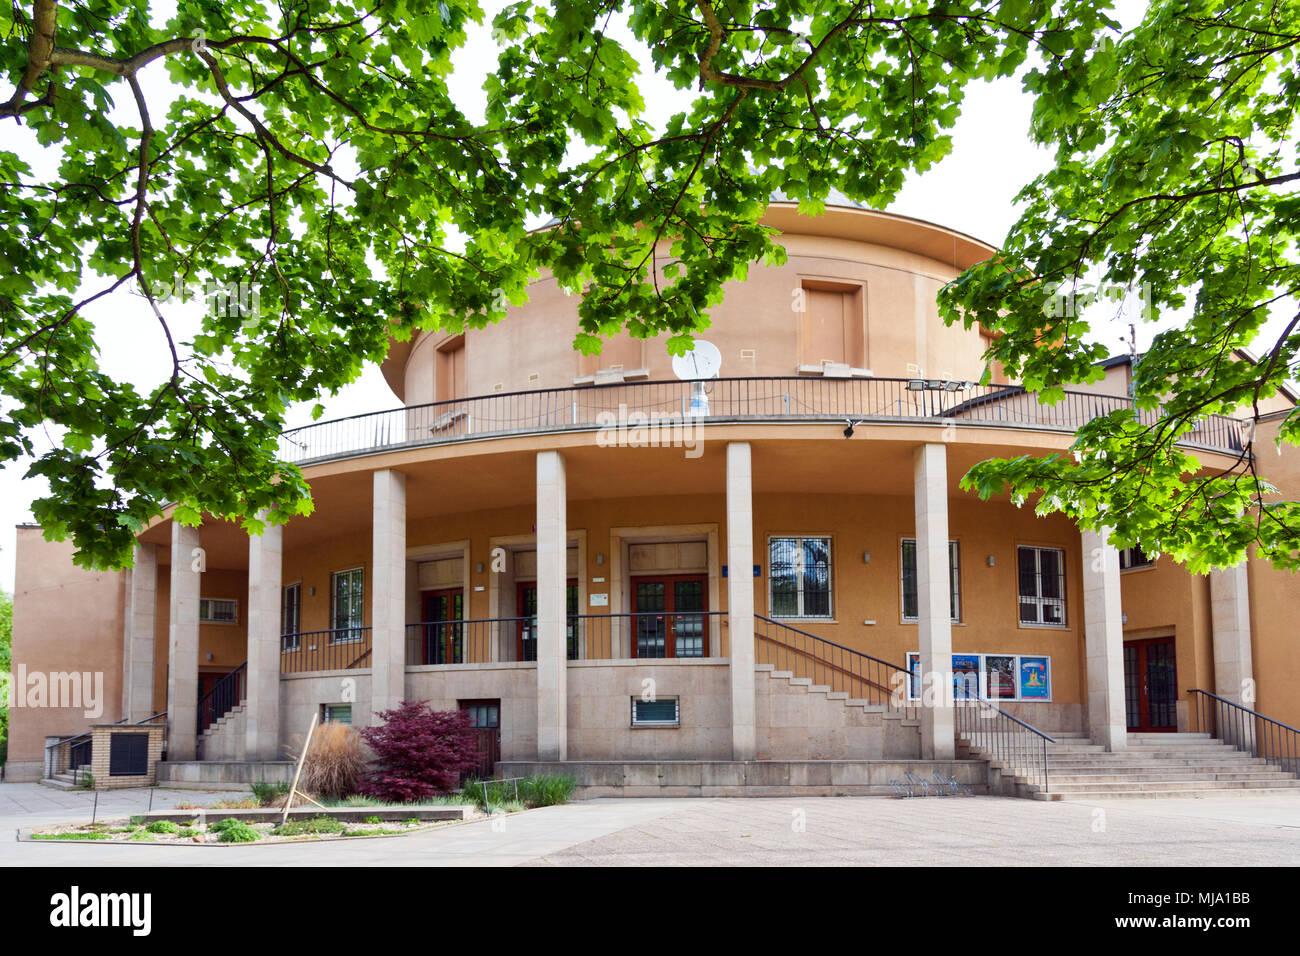 Le Planétarium, le parc Stromovka, Holesovice, Prague, Ceska Republika Photo Stock